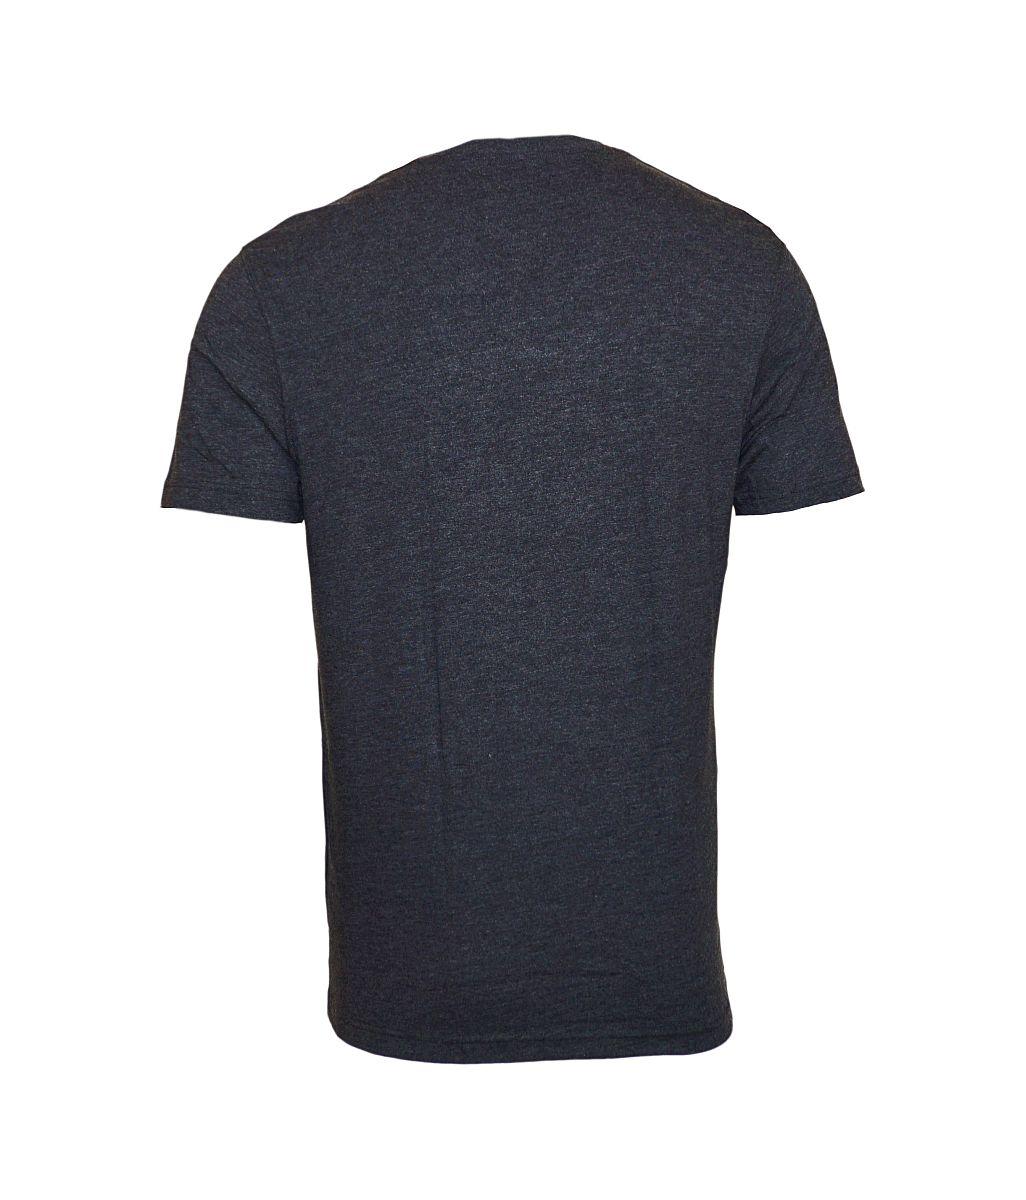 Daniel Hechter 2er Pack T-Shirts V-Ausschnitt 76002 172972 970 anthrazit melange SH17-DH2P